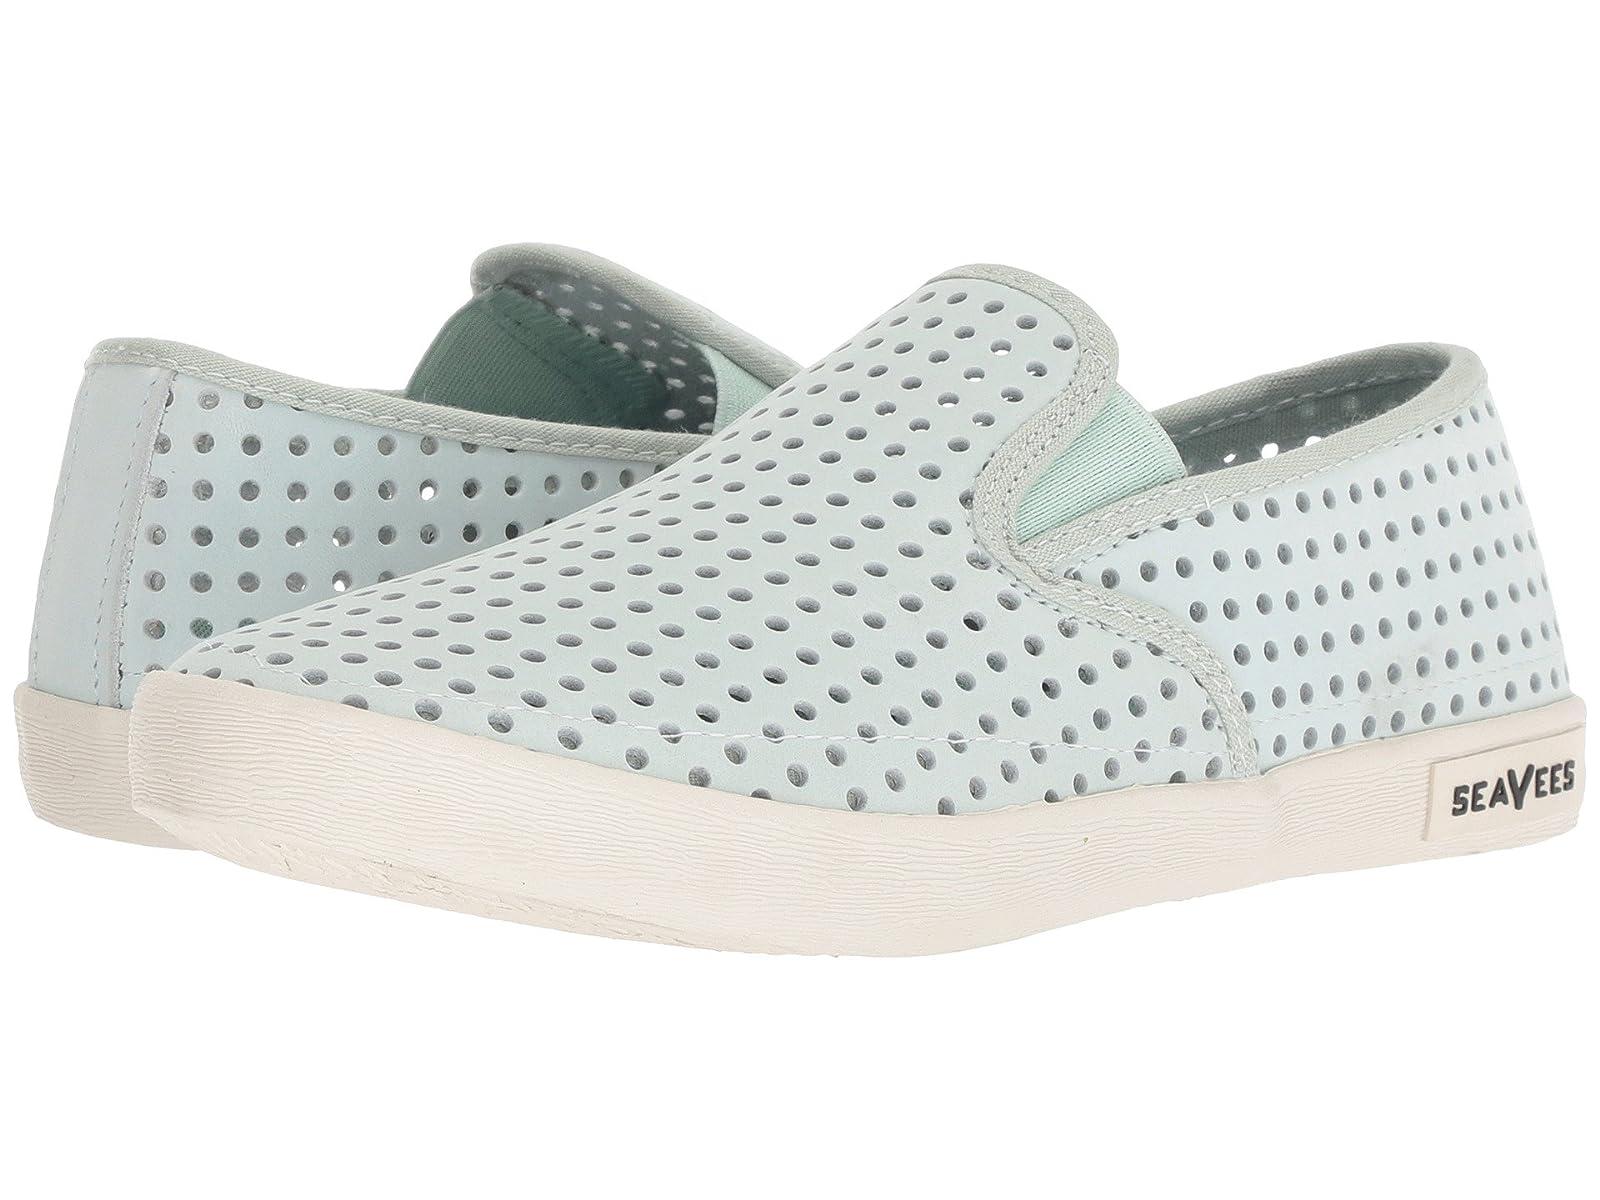 SeaVees Baja Slip-On PortalAtmospheric grades have affordable shoes